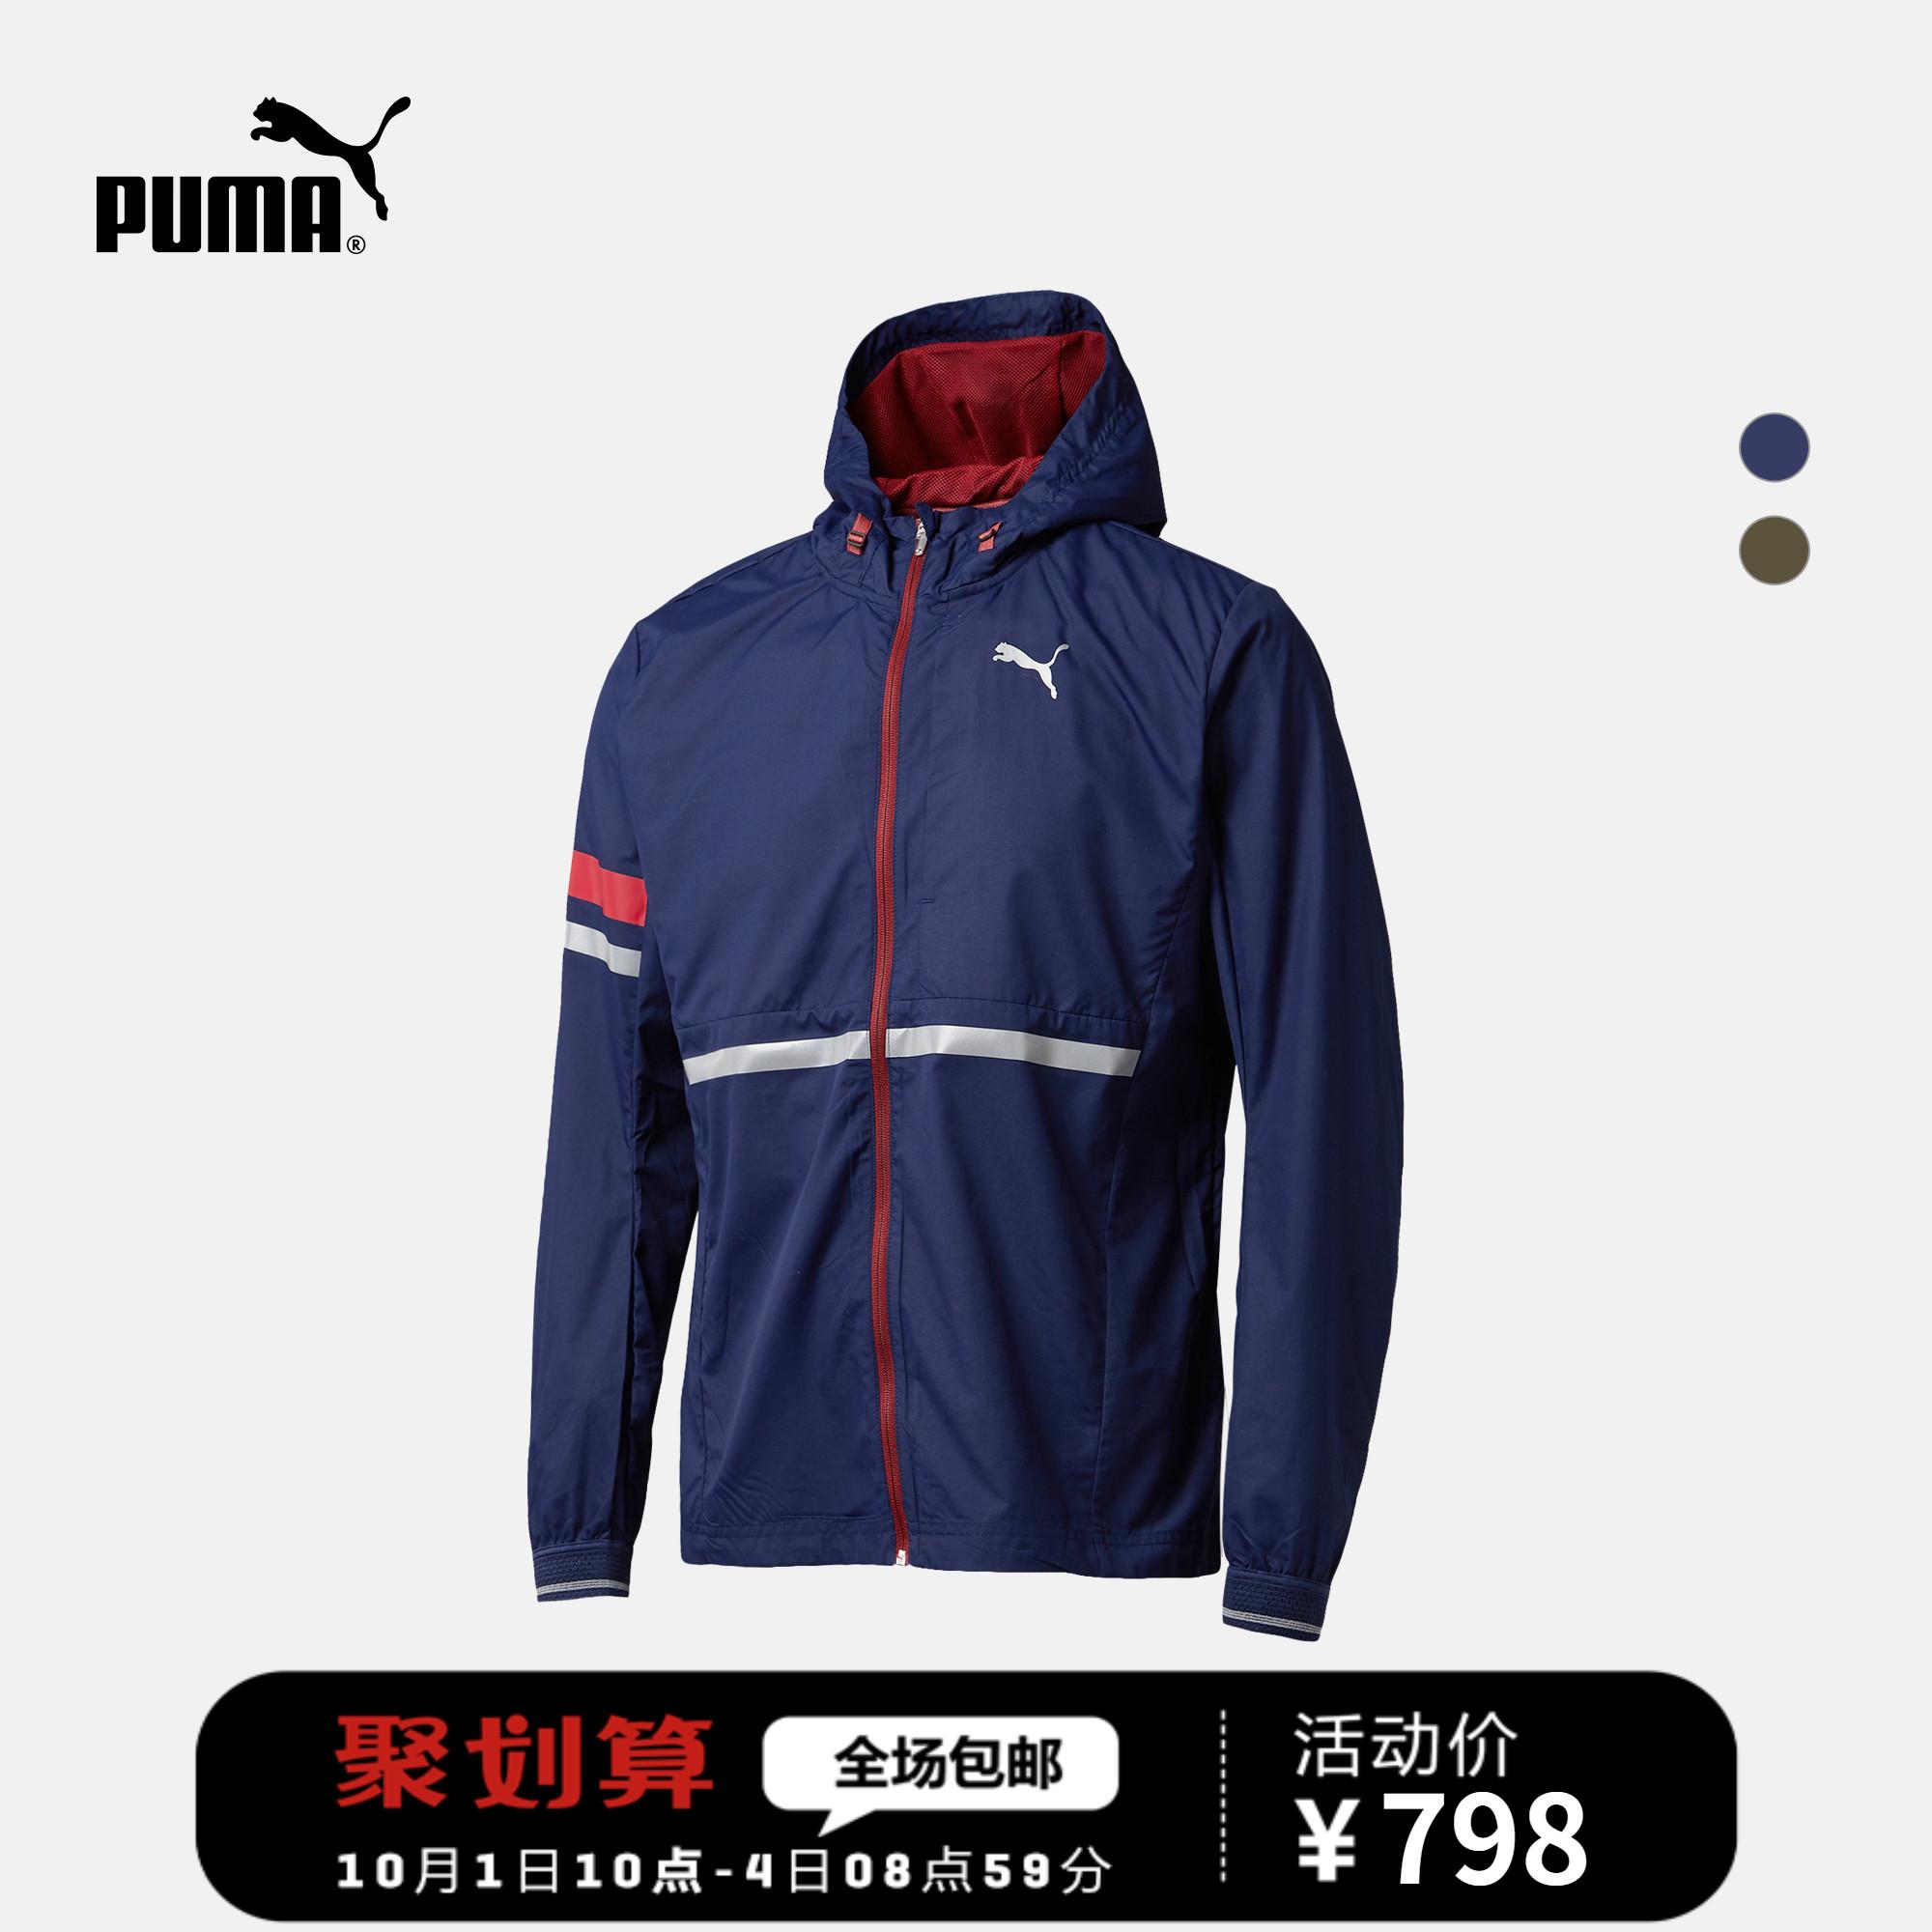 PUMA彪马官方 男子连帽外套 LastLap 517013